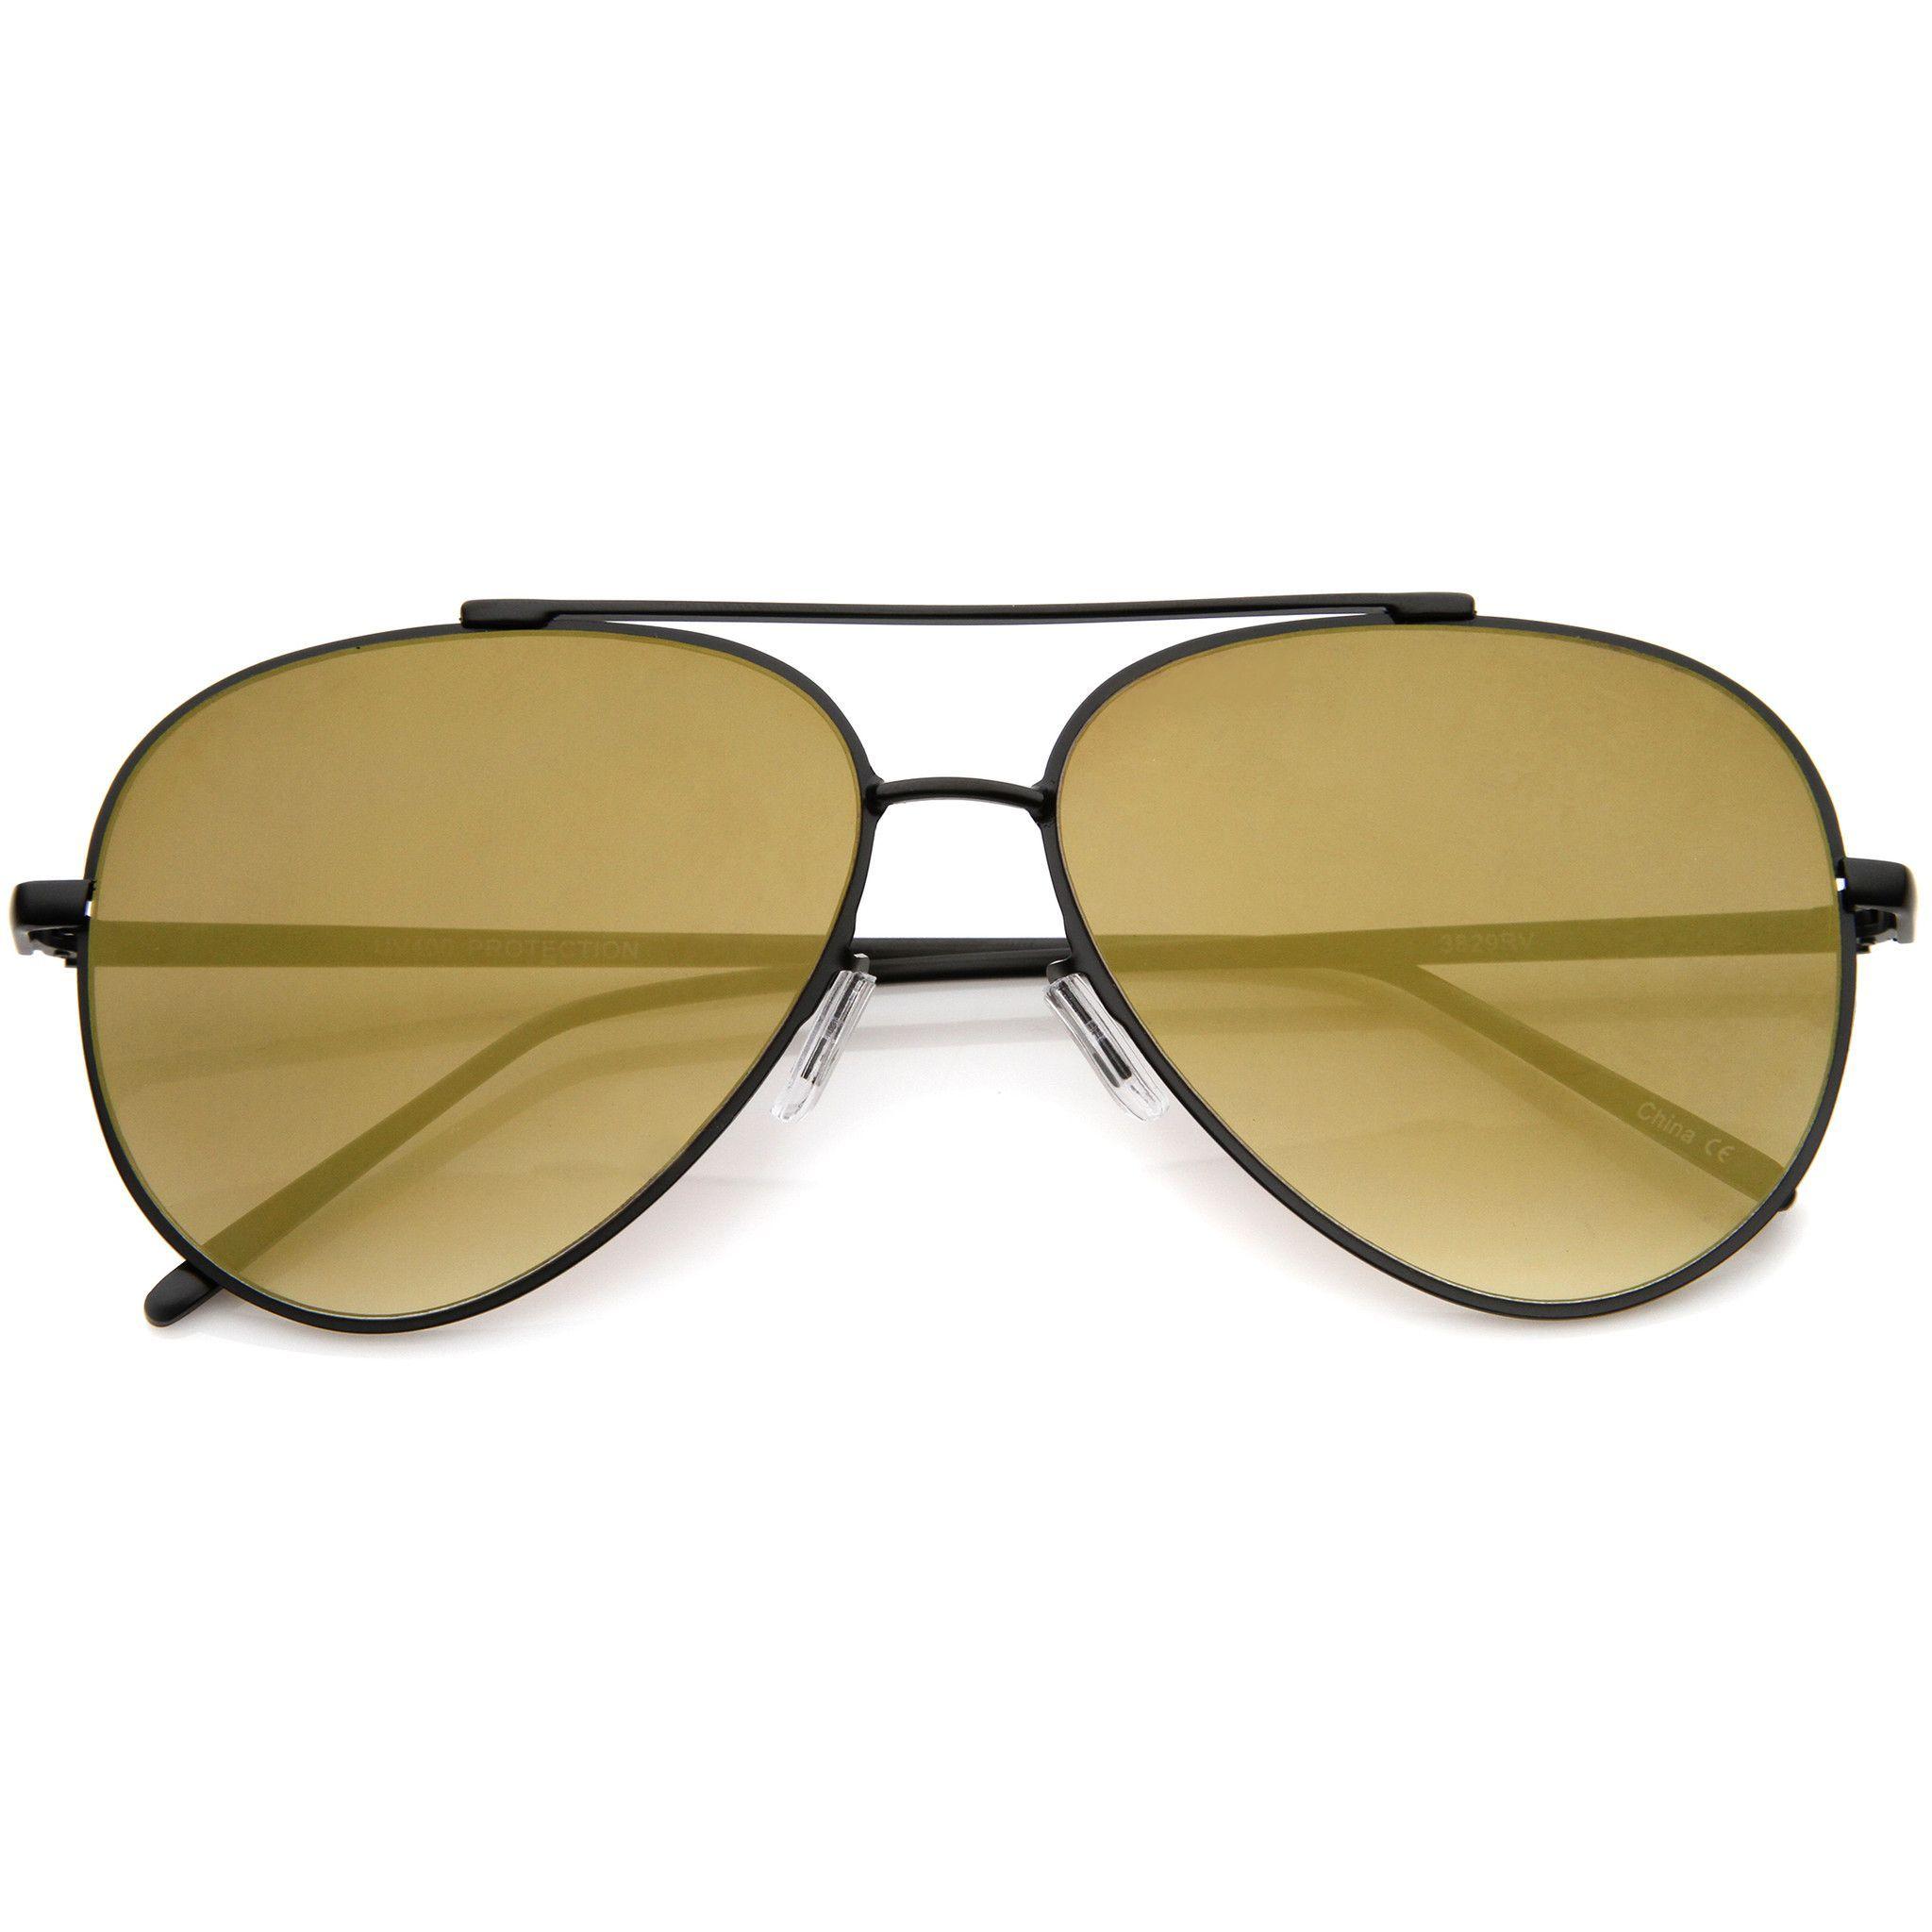 Modern Rimless Mirrored Flat Lens Aviator Sunglasses A230